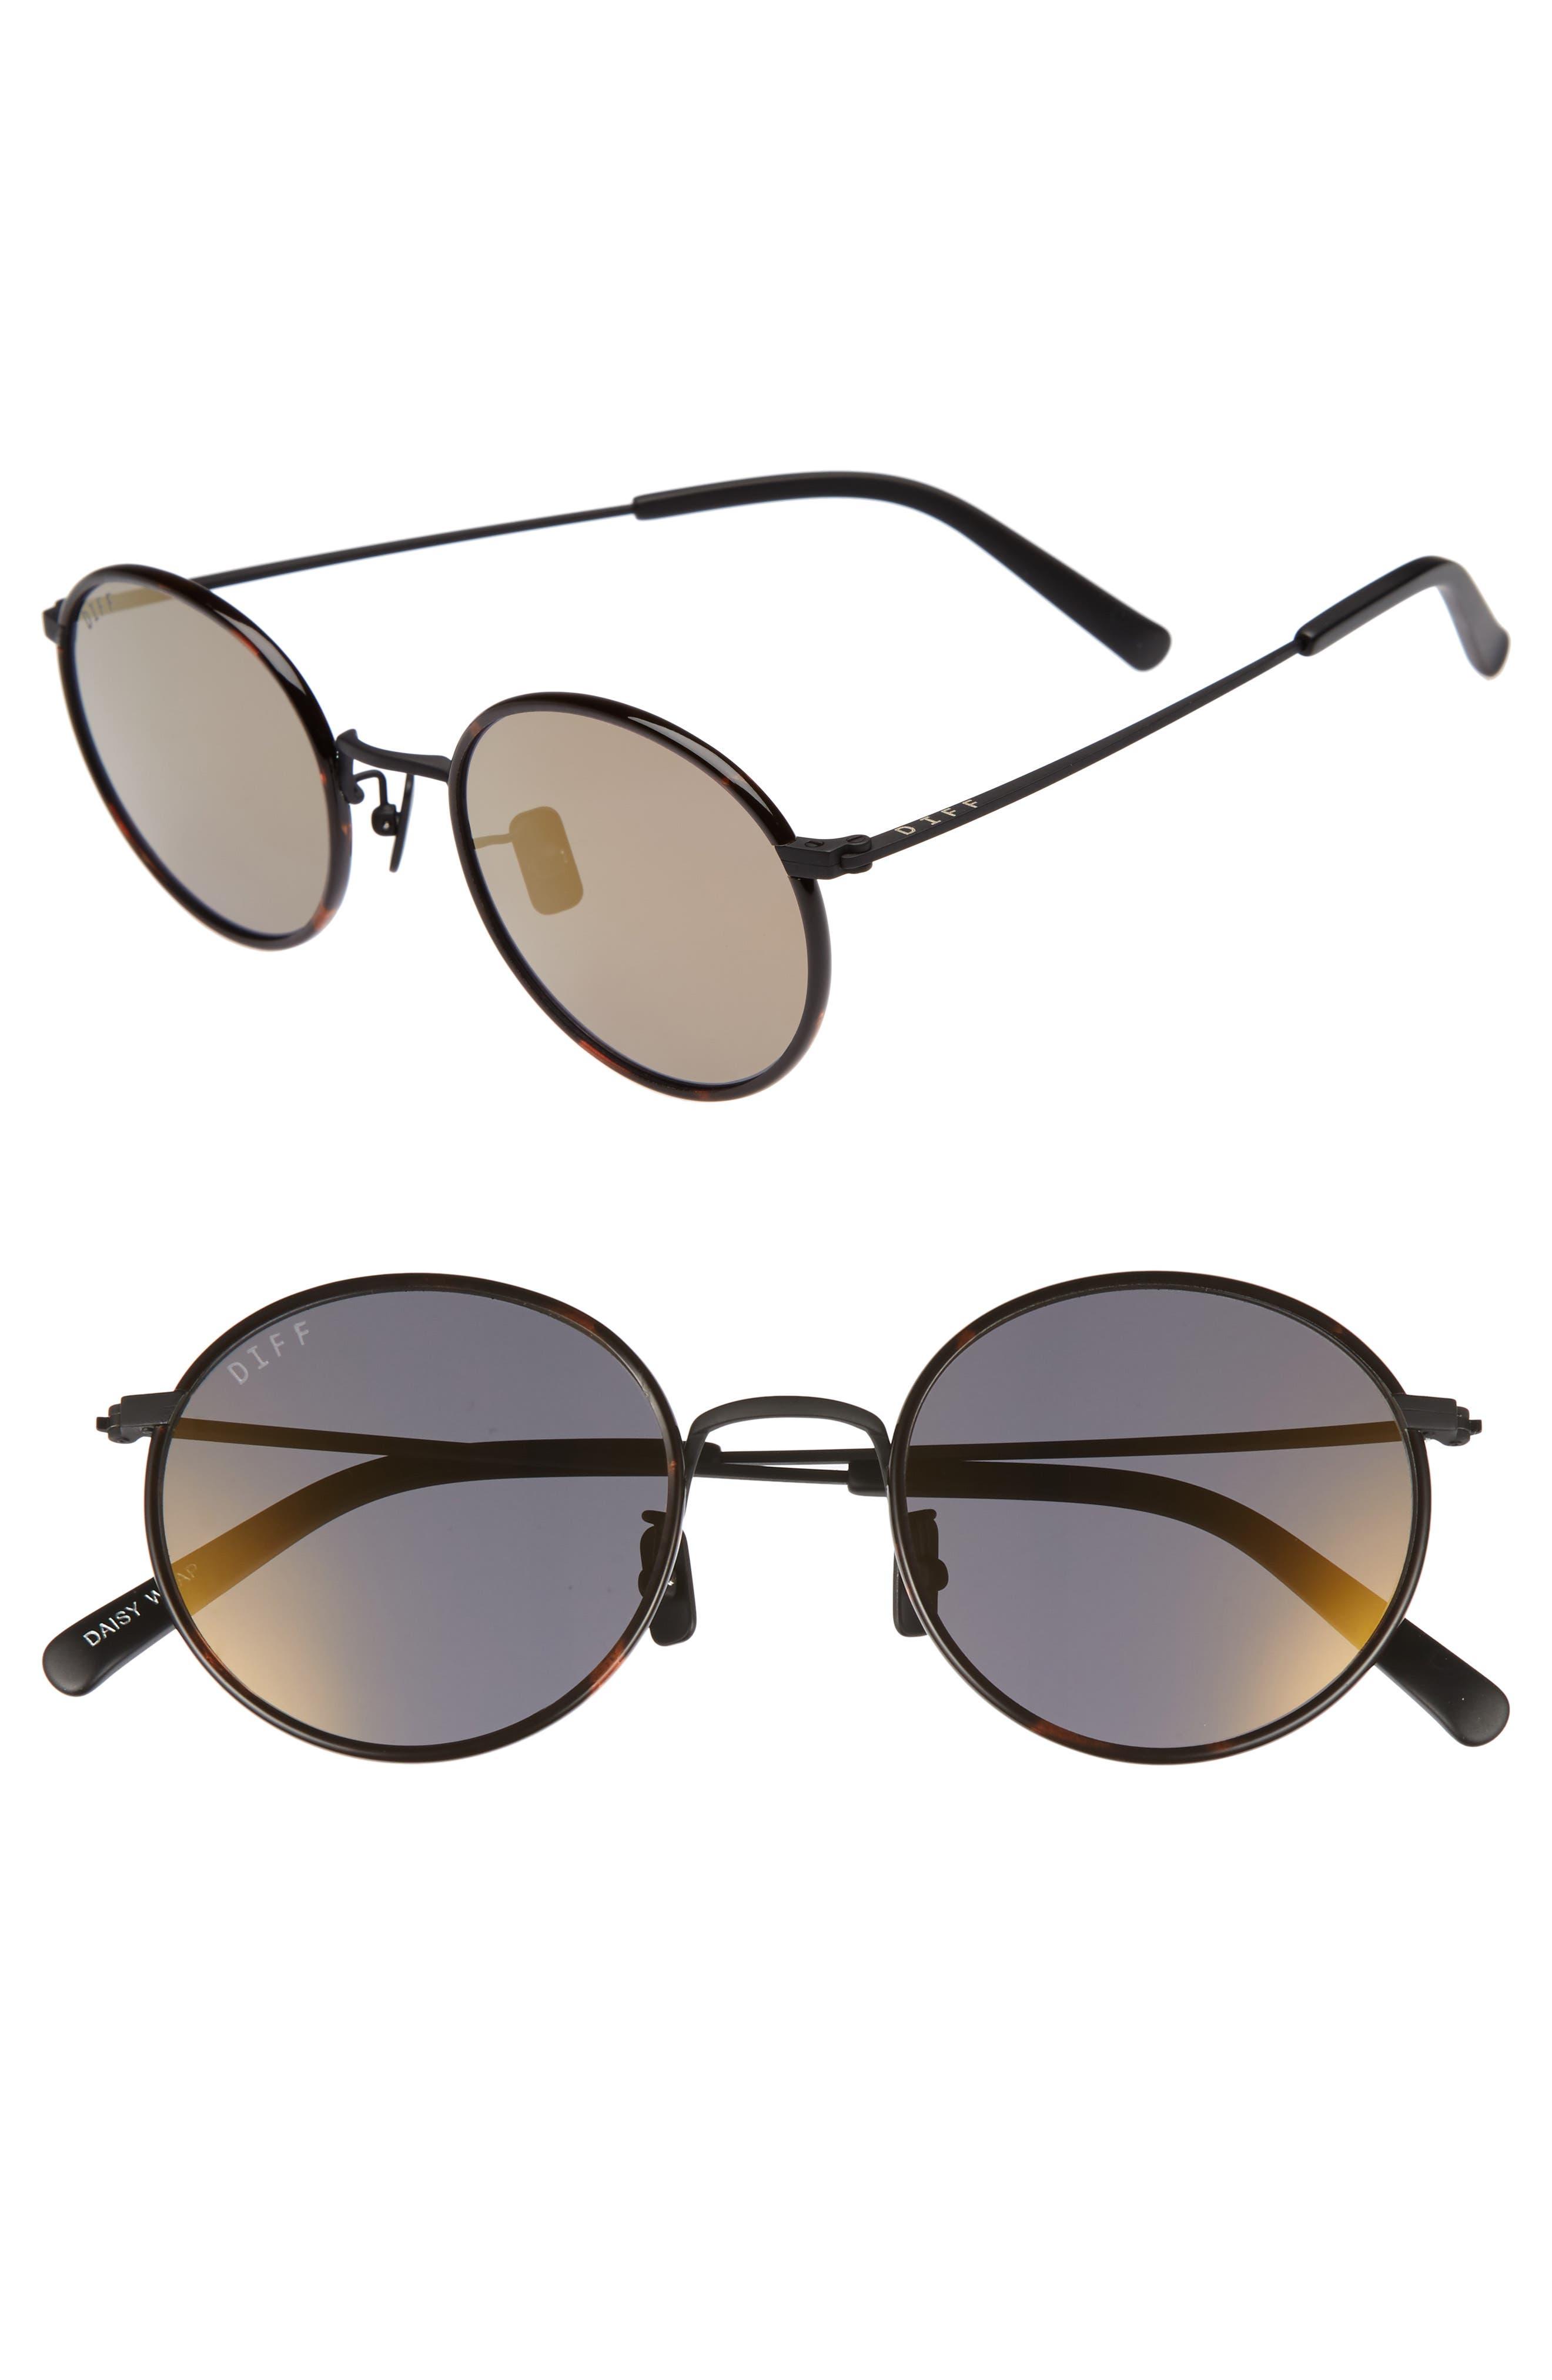 DIFF Daisy 57mm Polarized Round Lens Sunglasses